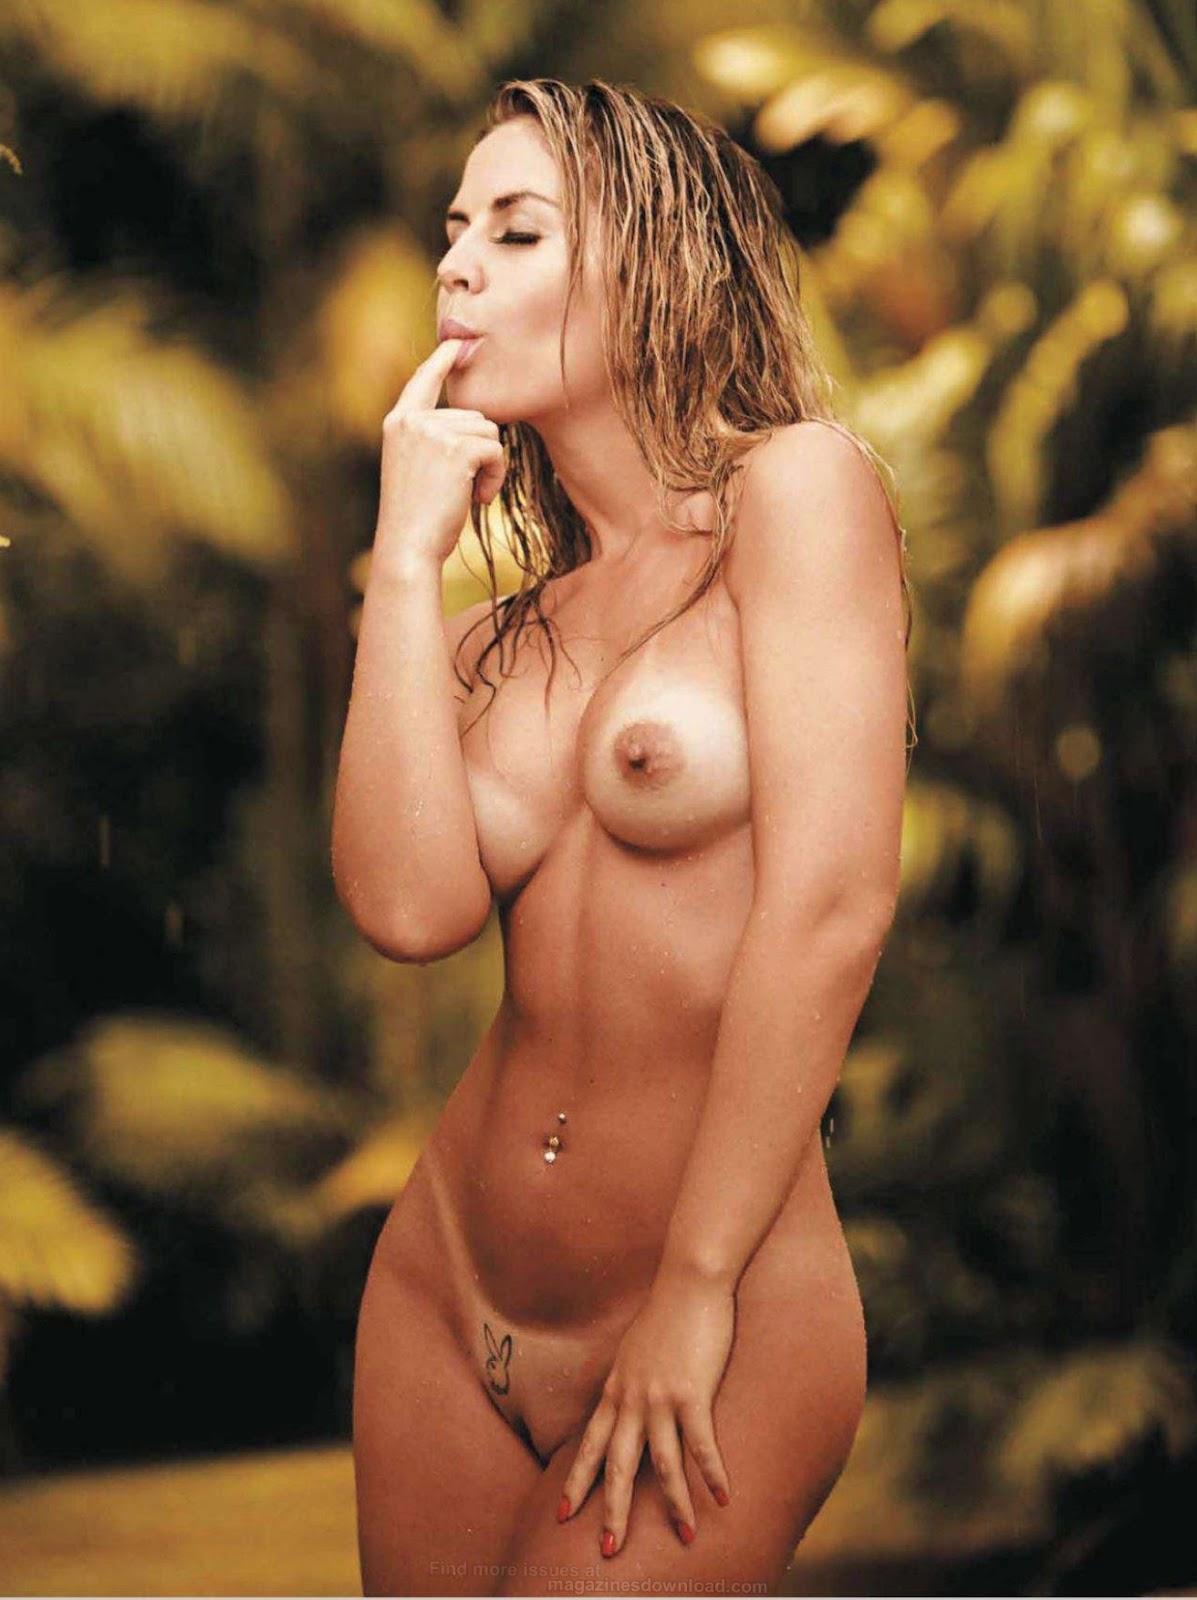 Playboy Meico Paola Feijo